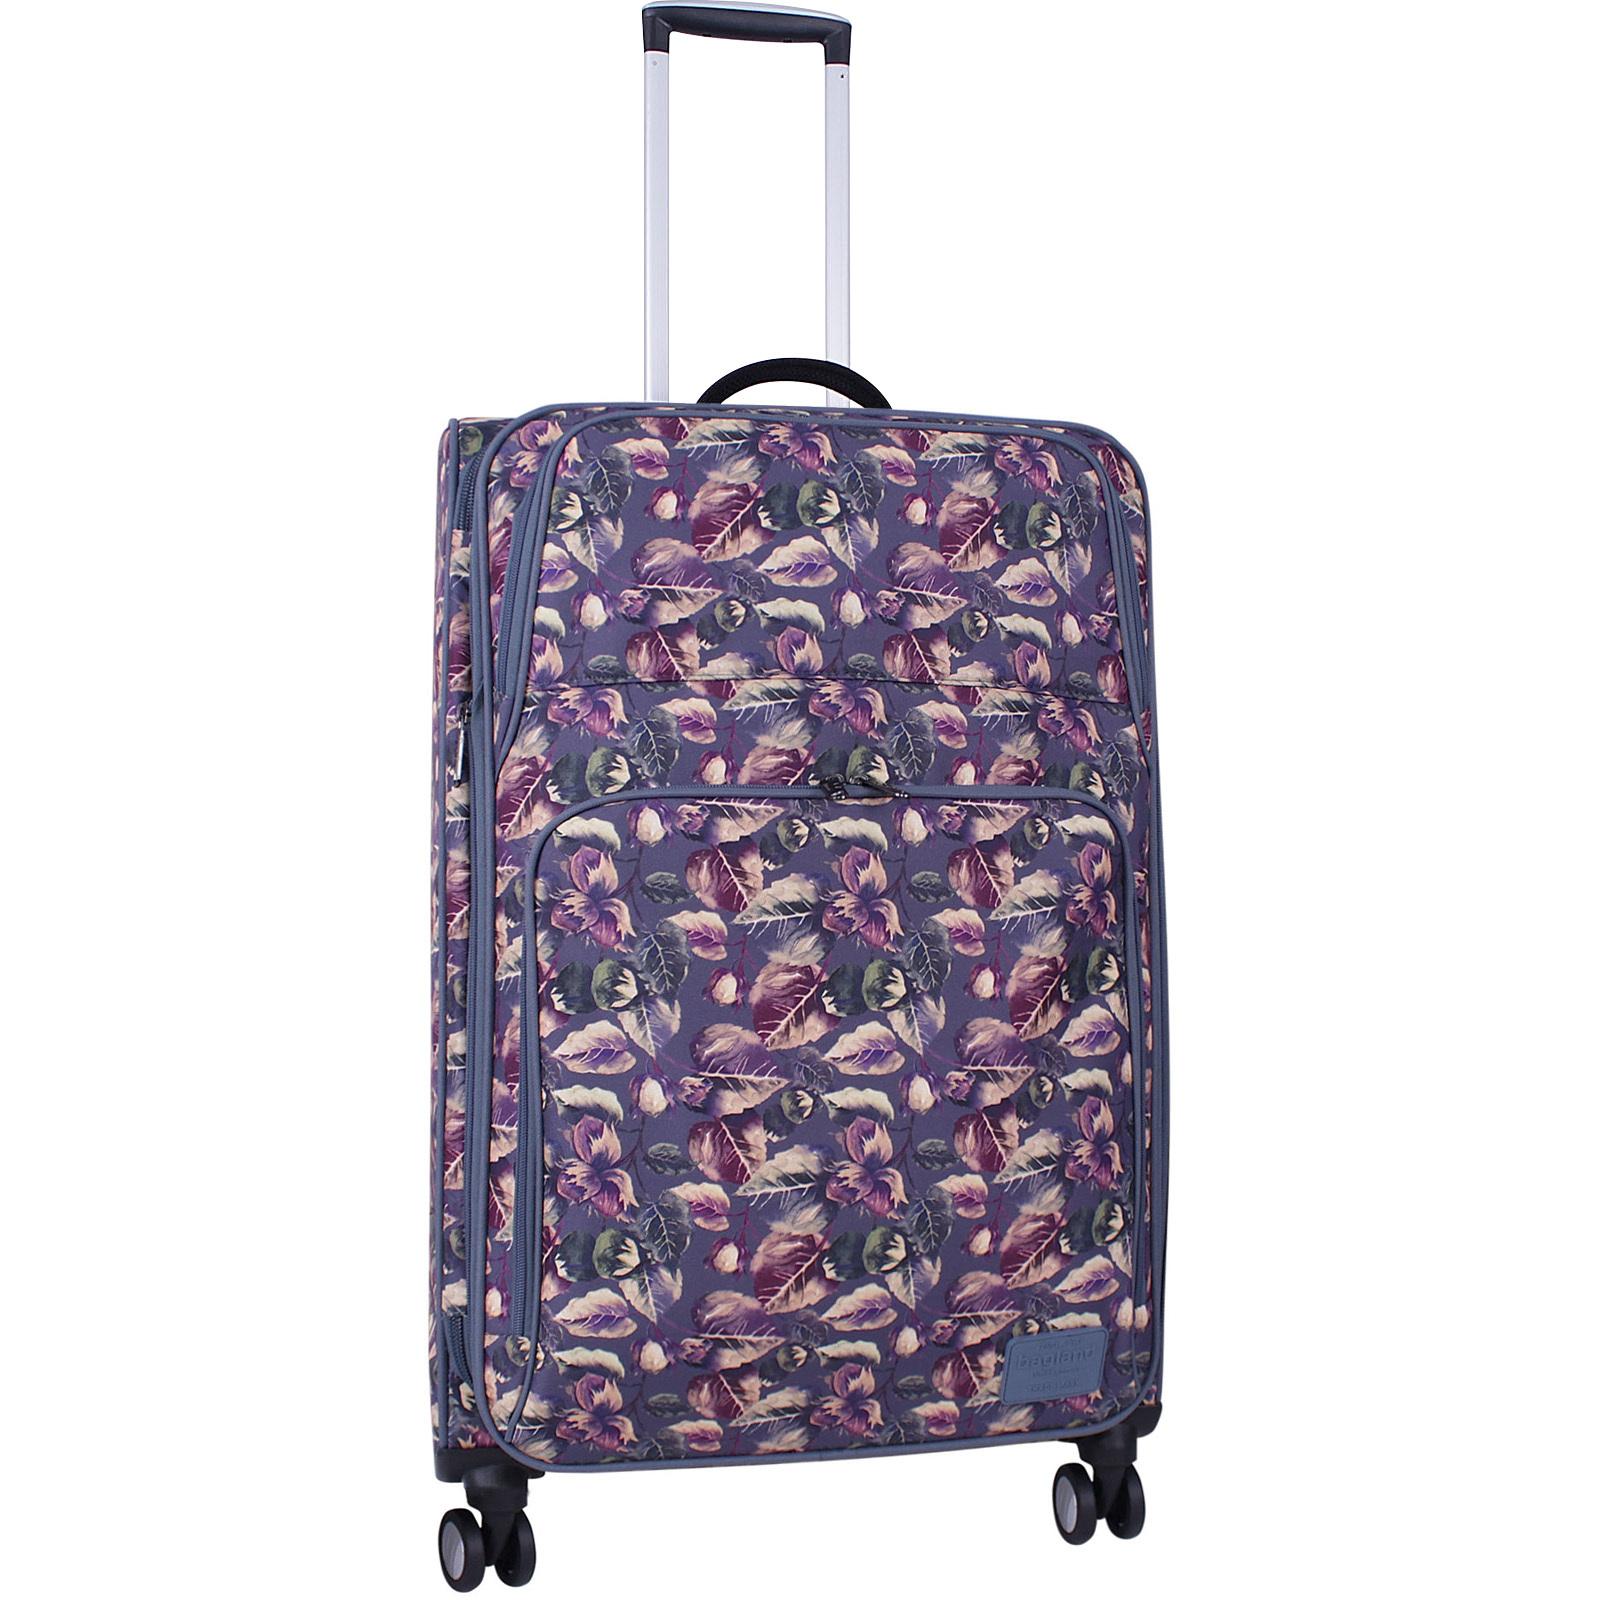 Дорожные чемоданы Чемодан Bagland Валенсия большой дизайн 83 л. сублімація 339 (0037966274) IMG_5733суб_339-1600.jpg